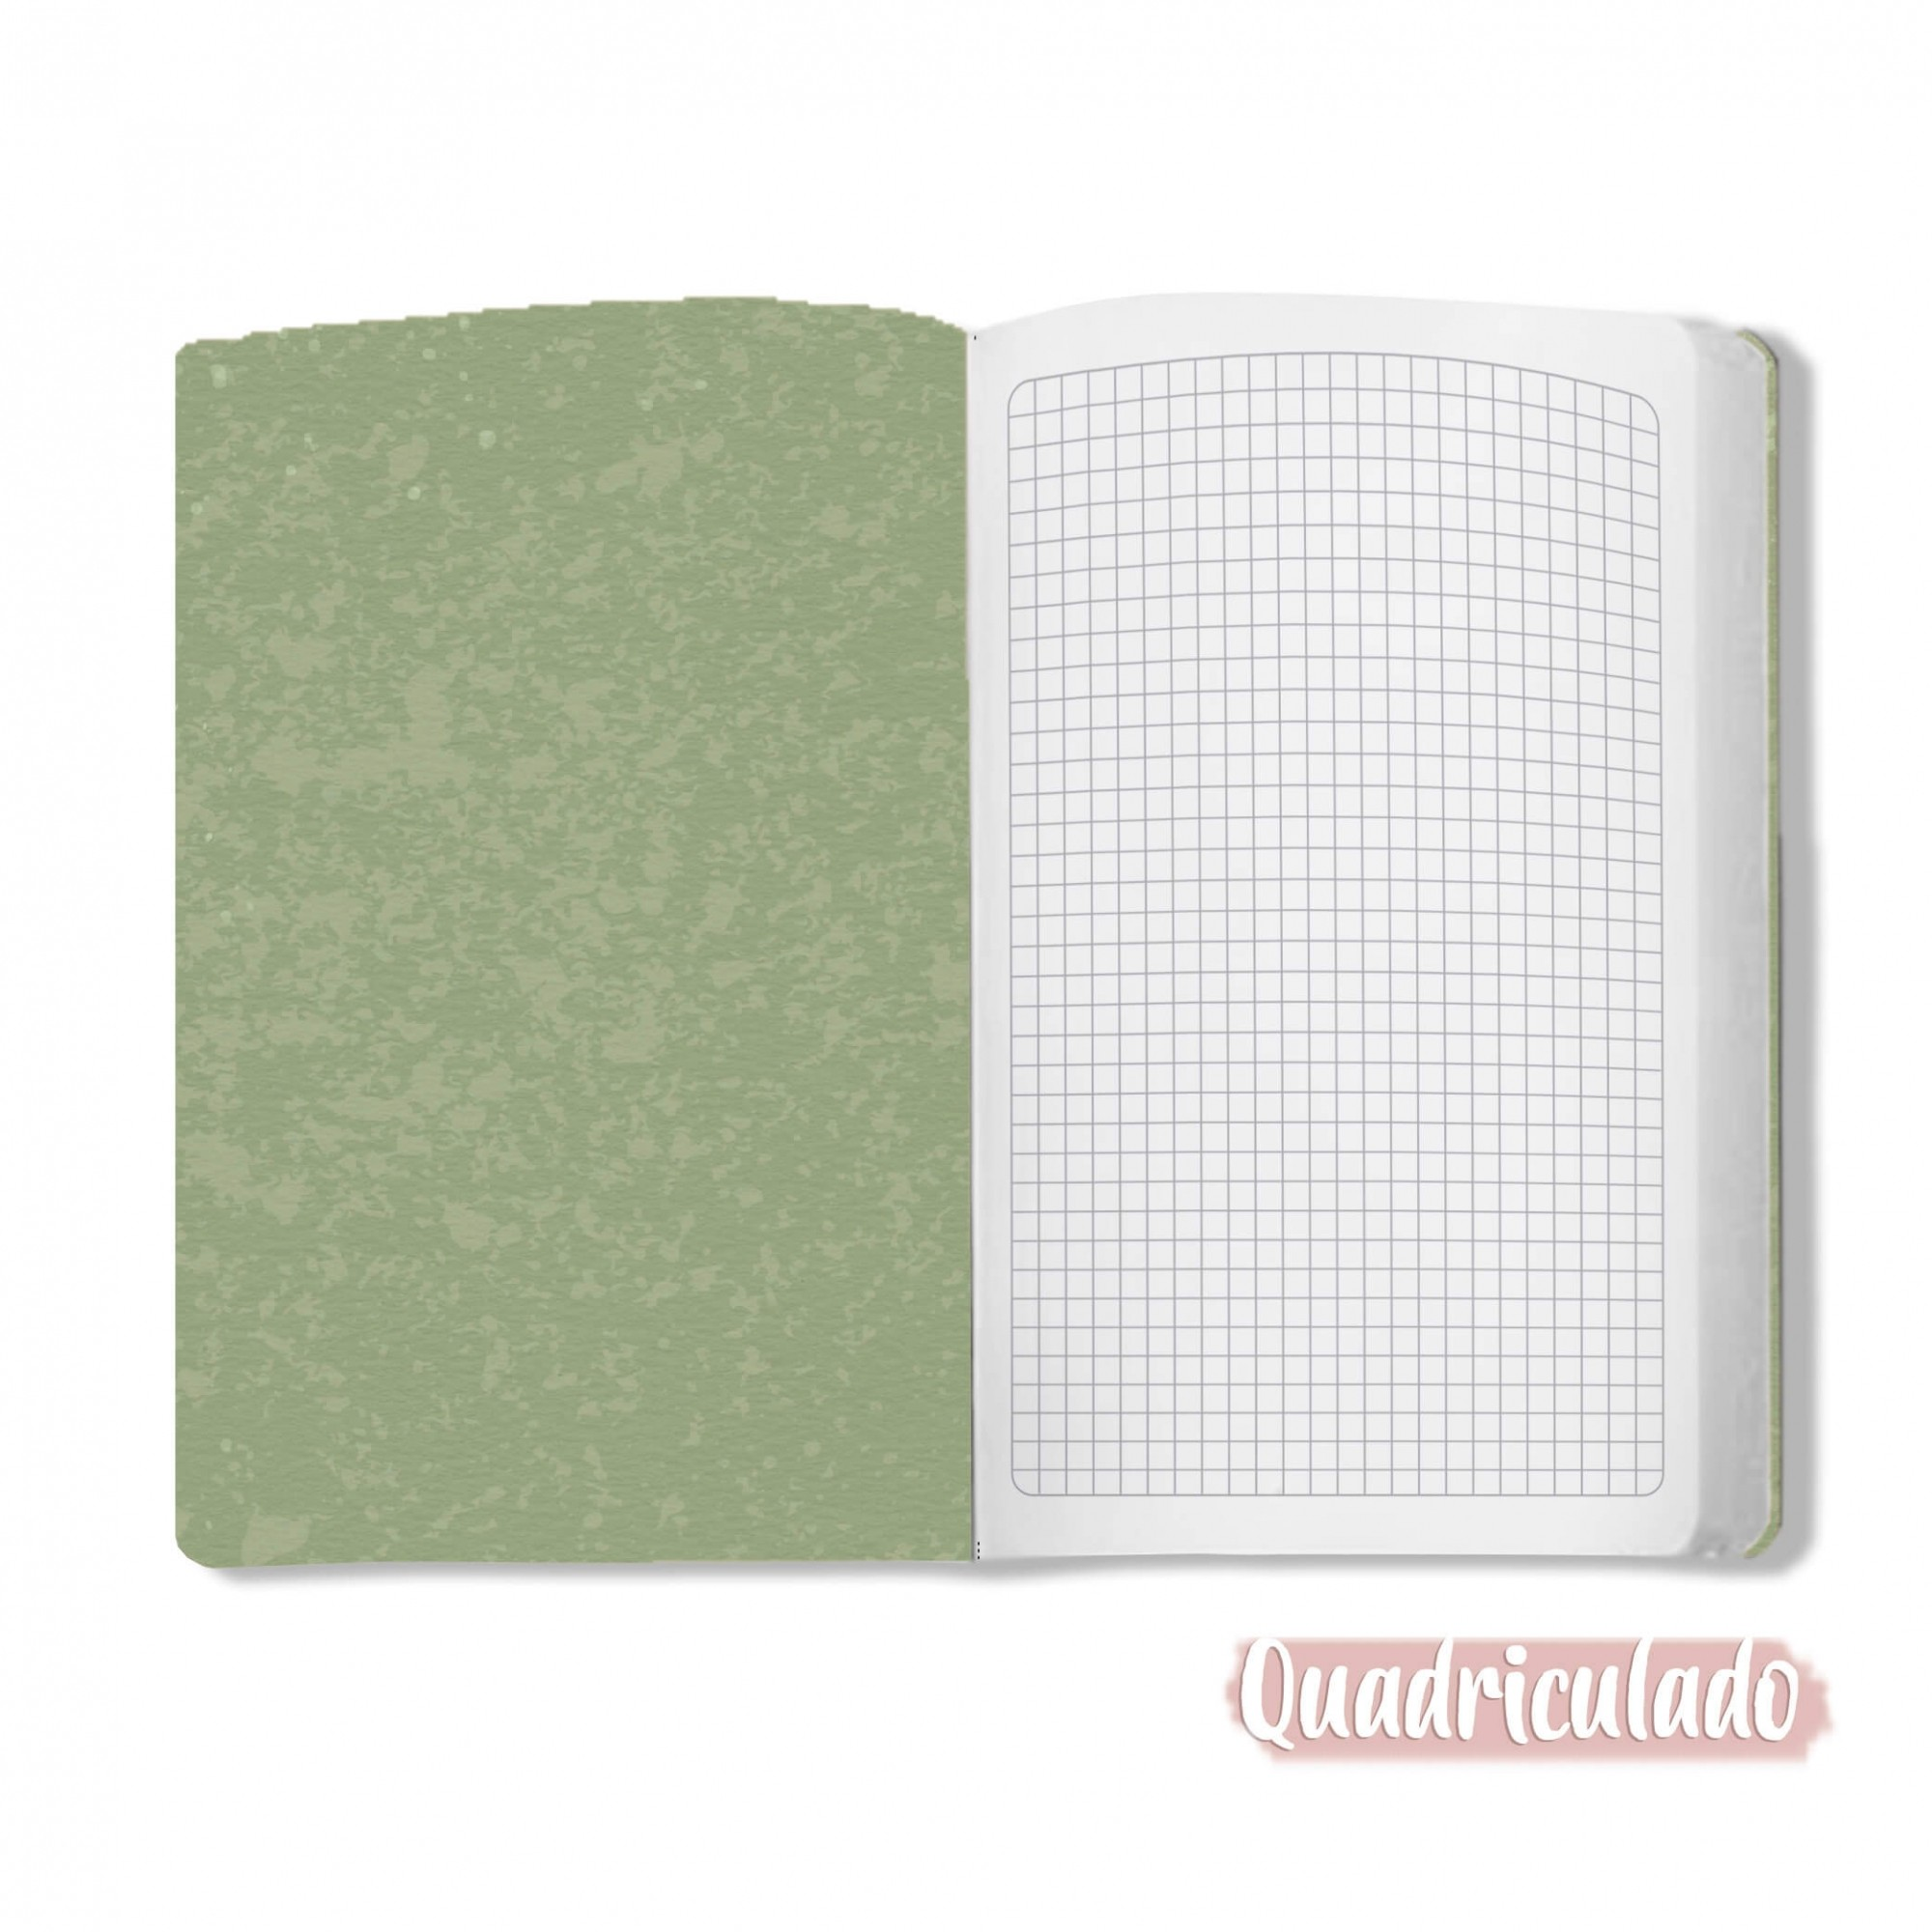 Caderno Orvalho - Scrap Minuto - Coleção Toda Básica / JuJu Scrapbook  - JuJu Scrapbook